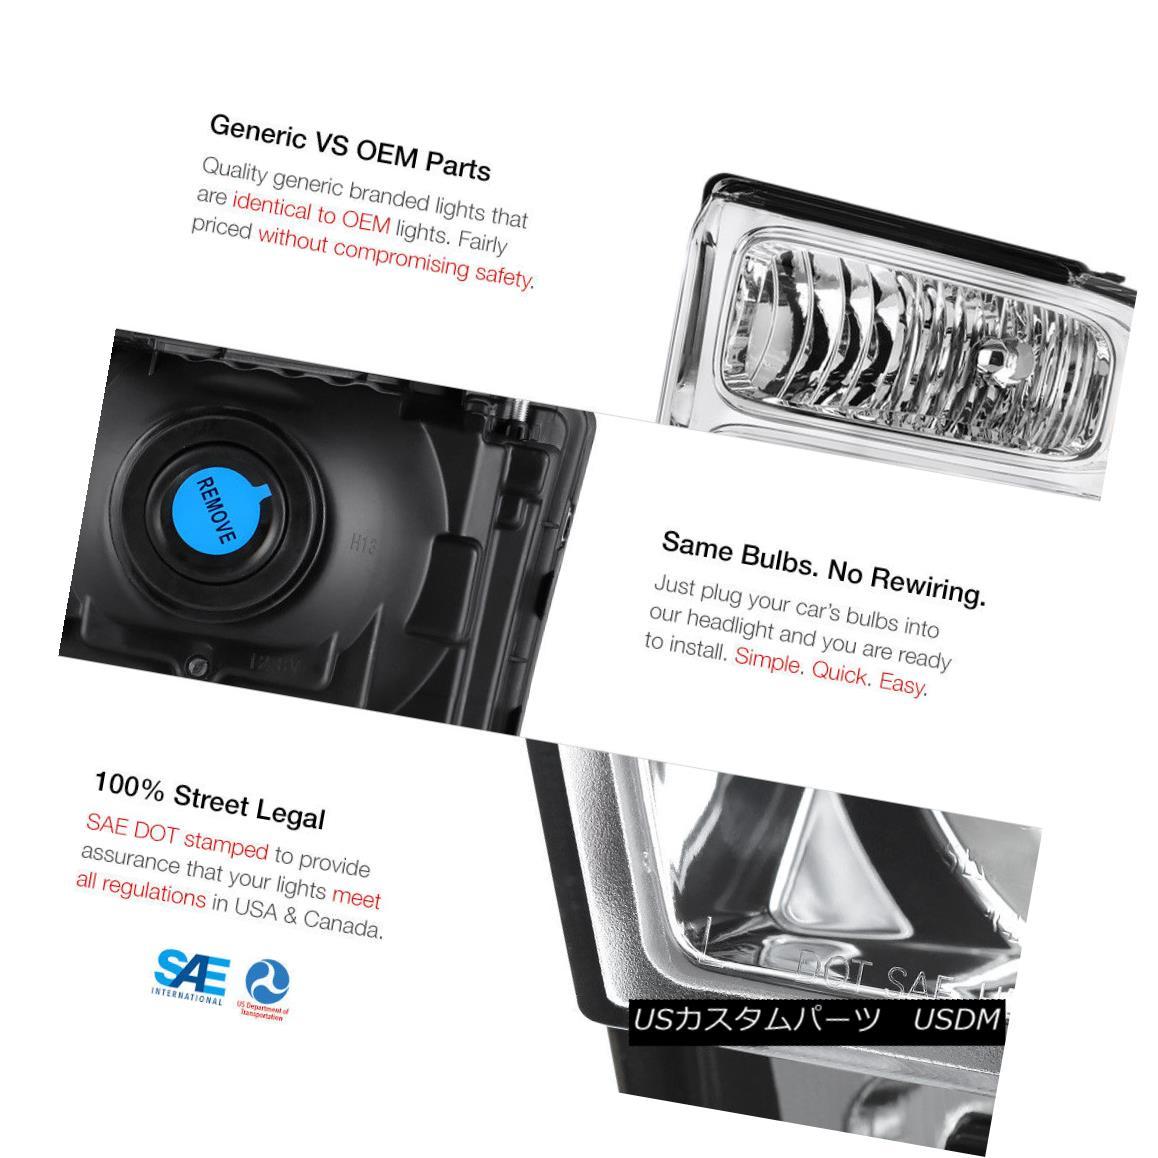 2013-2015 Can-Am Outlander 1000 X mr Drive Belt Dayco HP ATV OEM Upgrade vx